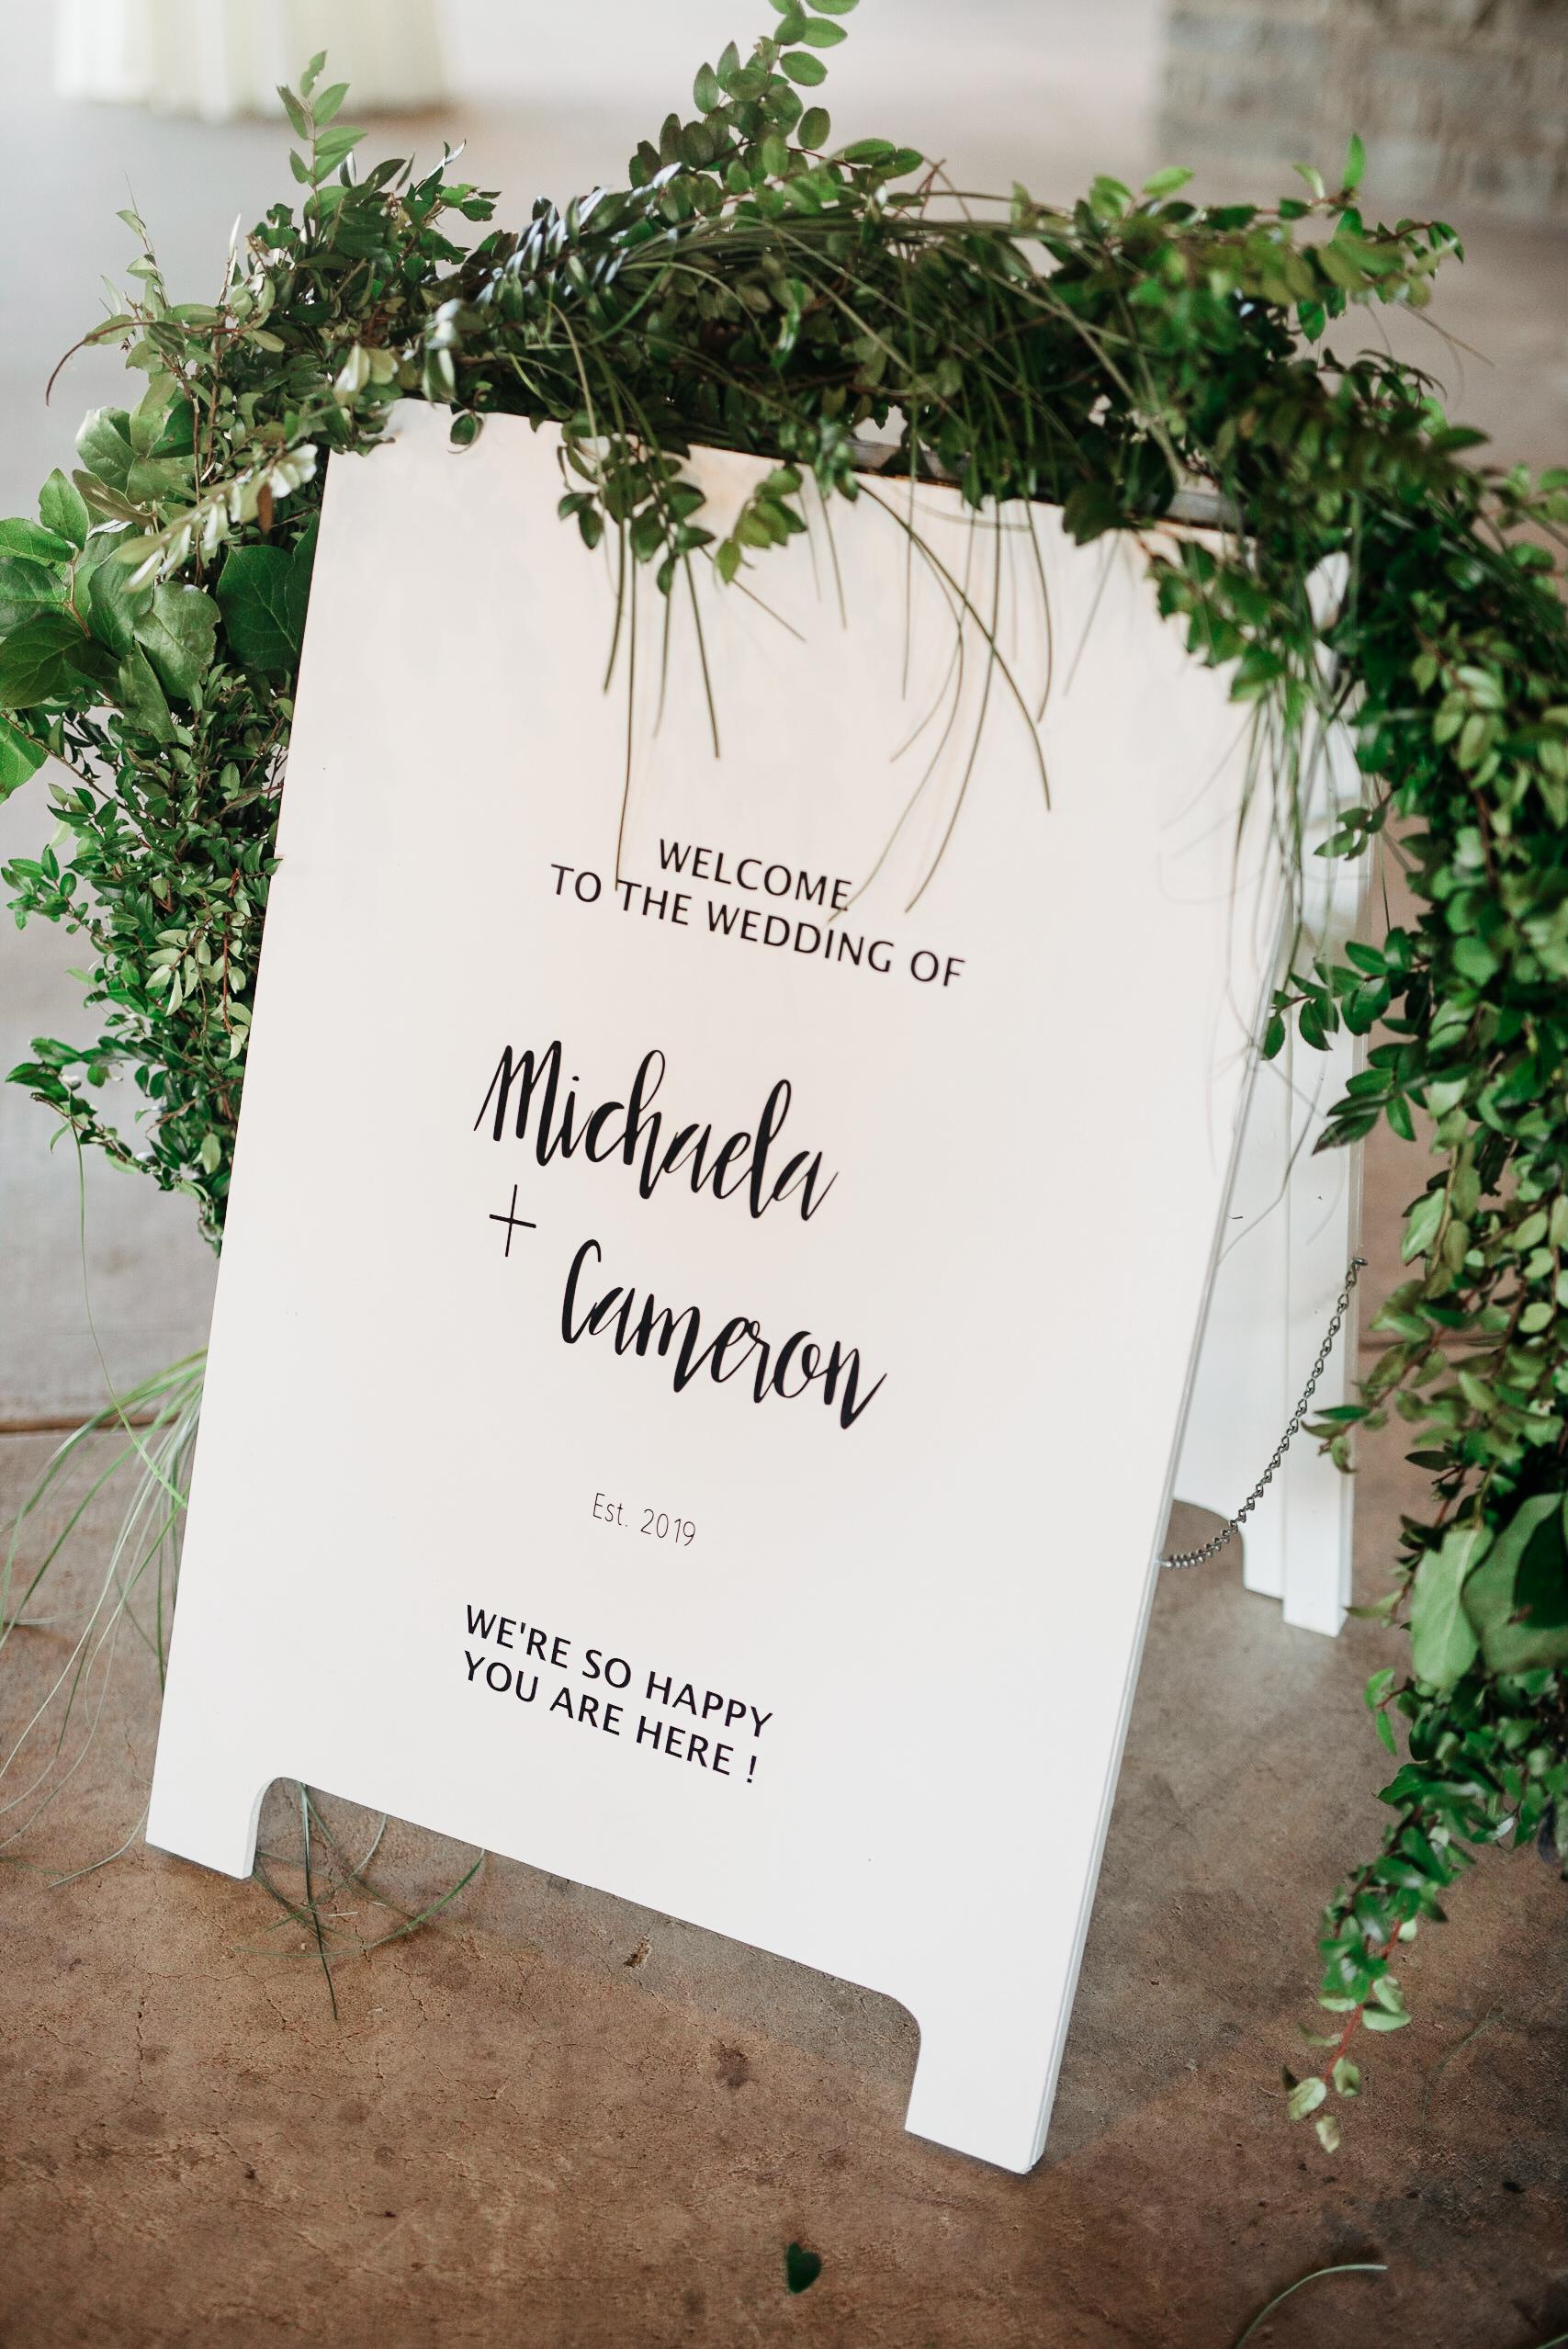 okc-wedding-photographer-coles-garden-wedding-okc-best-wedding-photographers-79.jpg